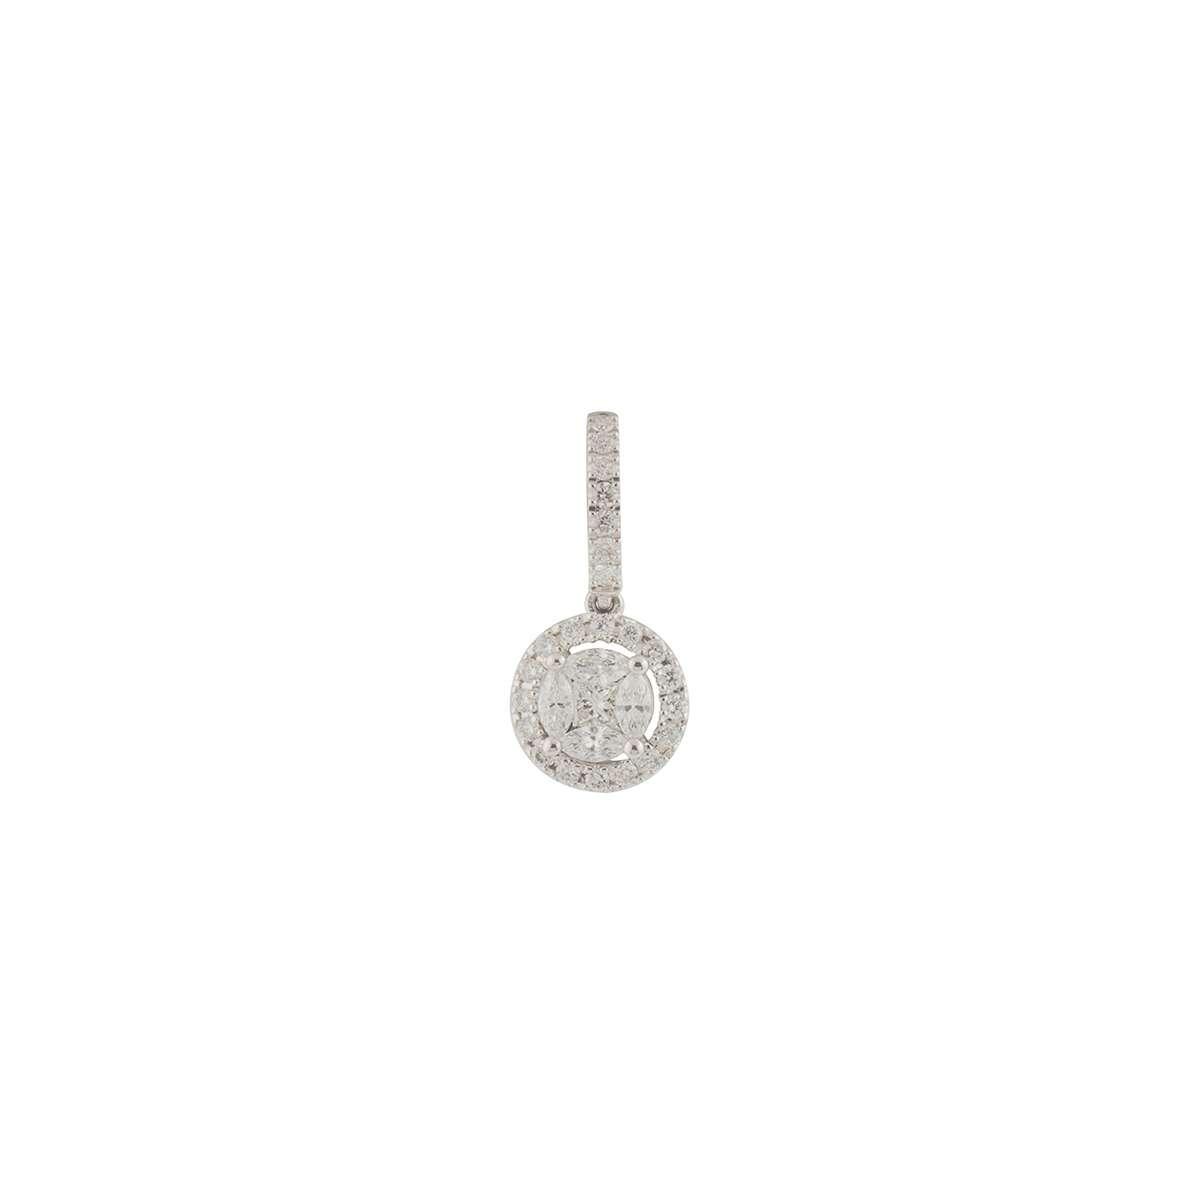 White Gold Diamond Cluster Pendant 0.45ct G-H/VS-VVS